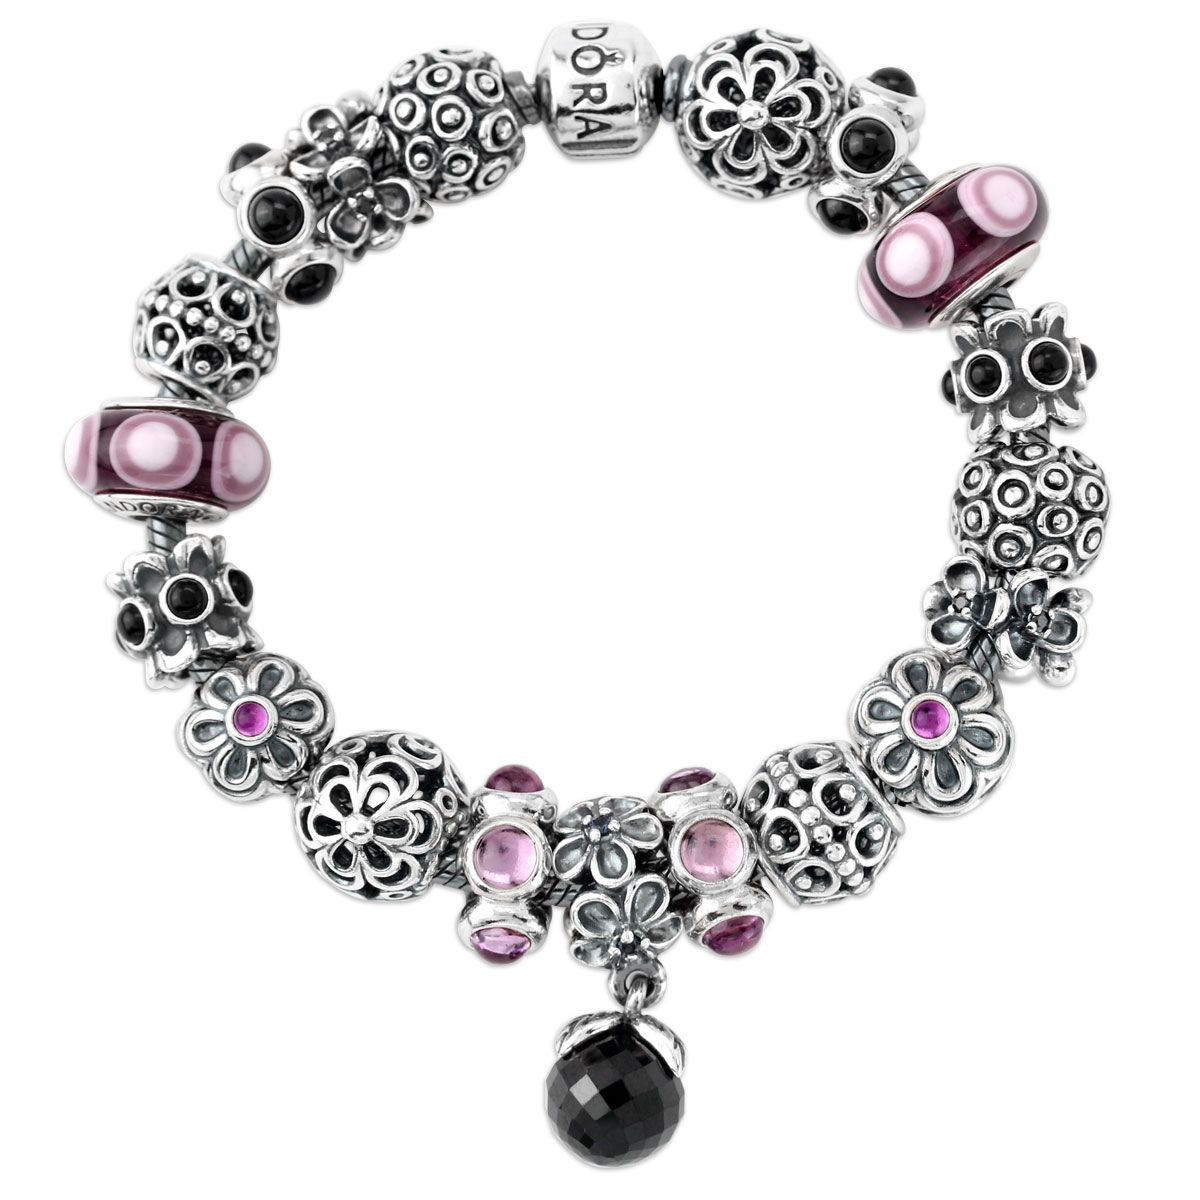 pin pandora bracelet design ideas 005 on pinterest ideas